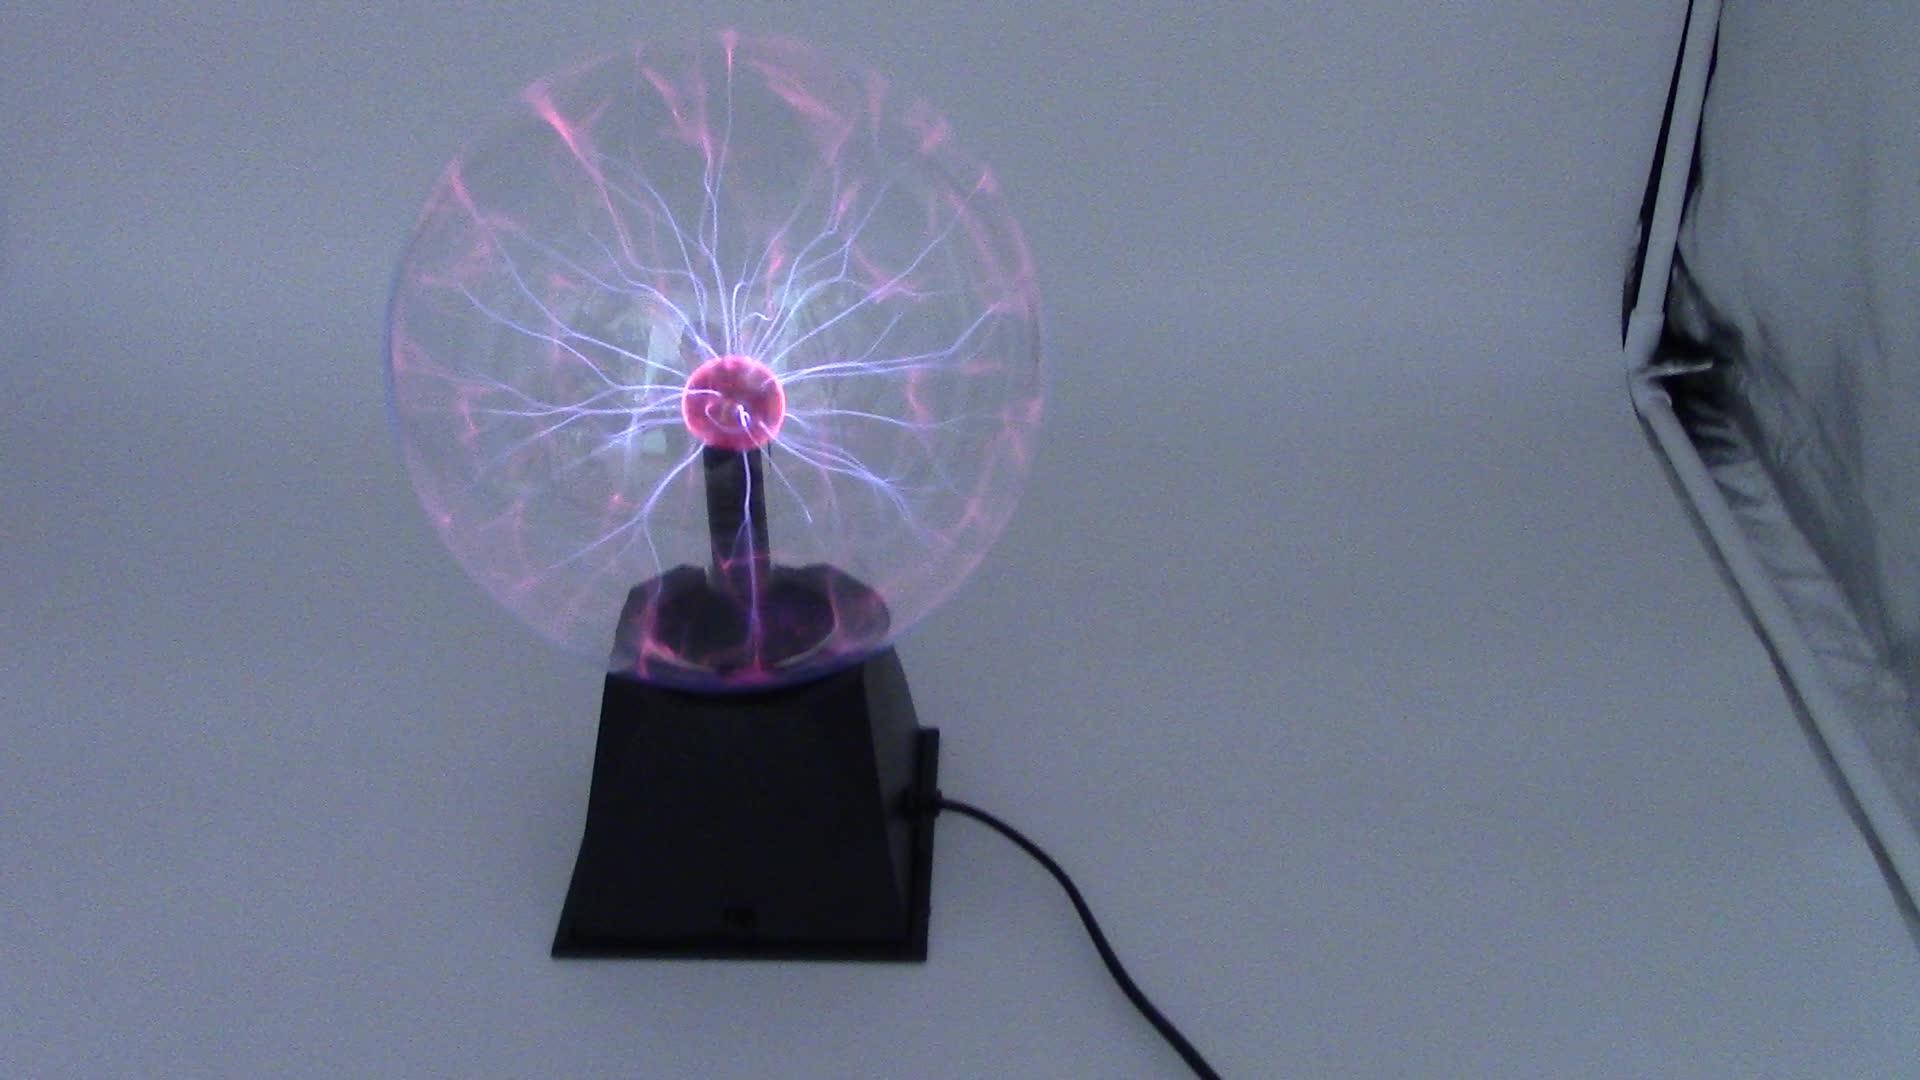 Gelsonlab HSPE-039 Plasma Ball Touch Sensitive 3 นิ้วขนาดเล็กโคมไฟพลาสม่า Usb หรือแหล่งจ่ายไฟแบตเตอรี่ Lightning Sphere Light